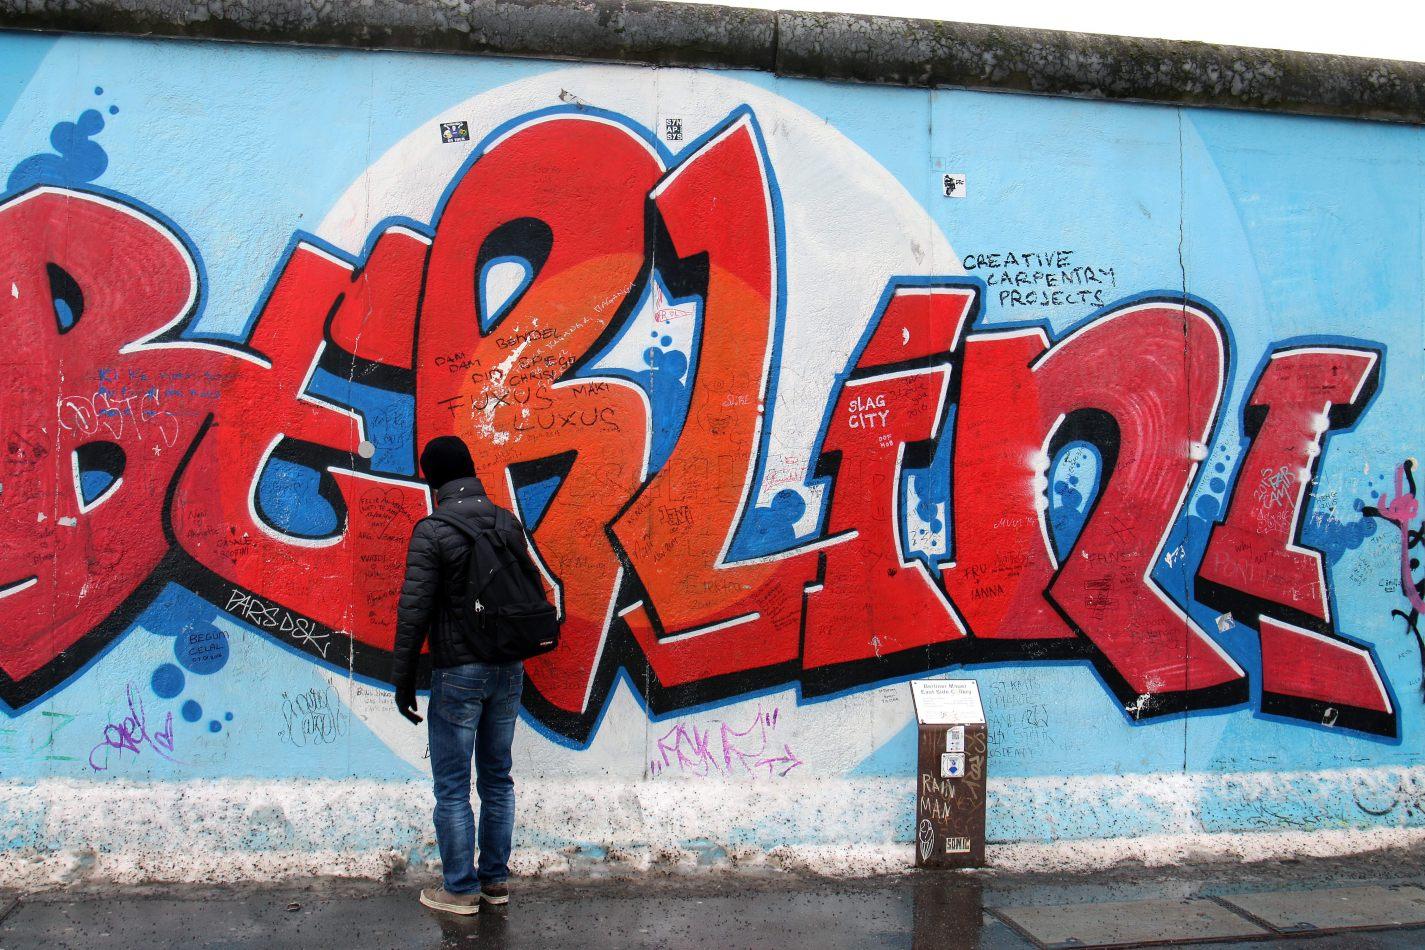 Anthony Ellis Photography: Das Ist - Berlin!